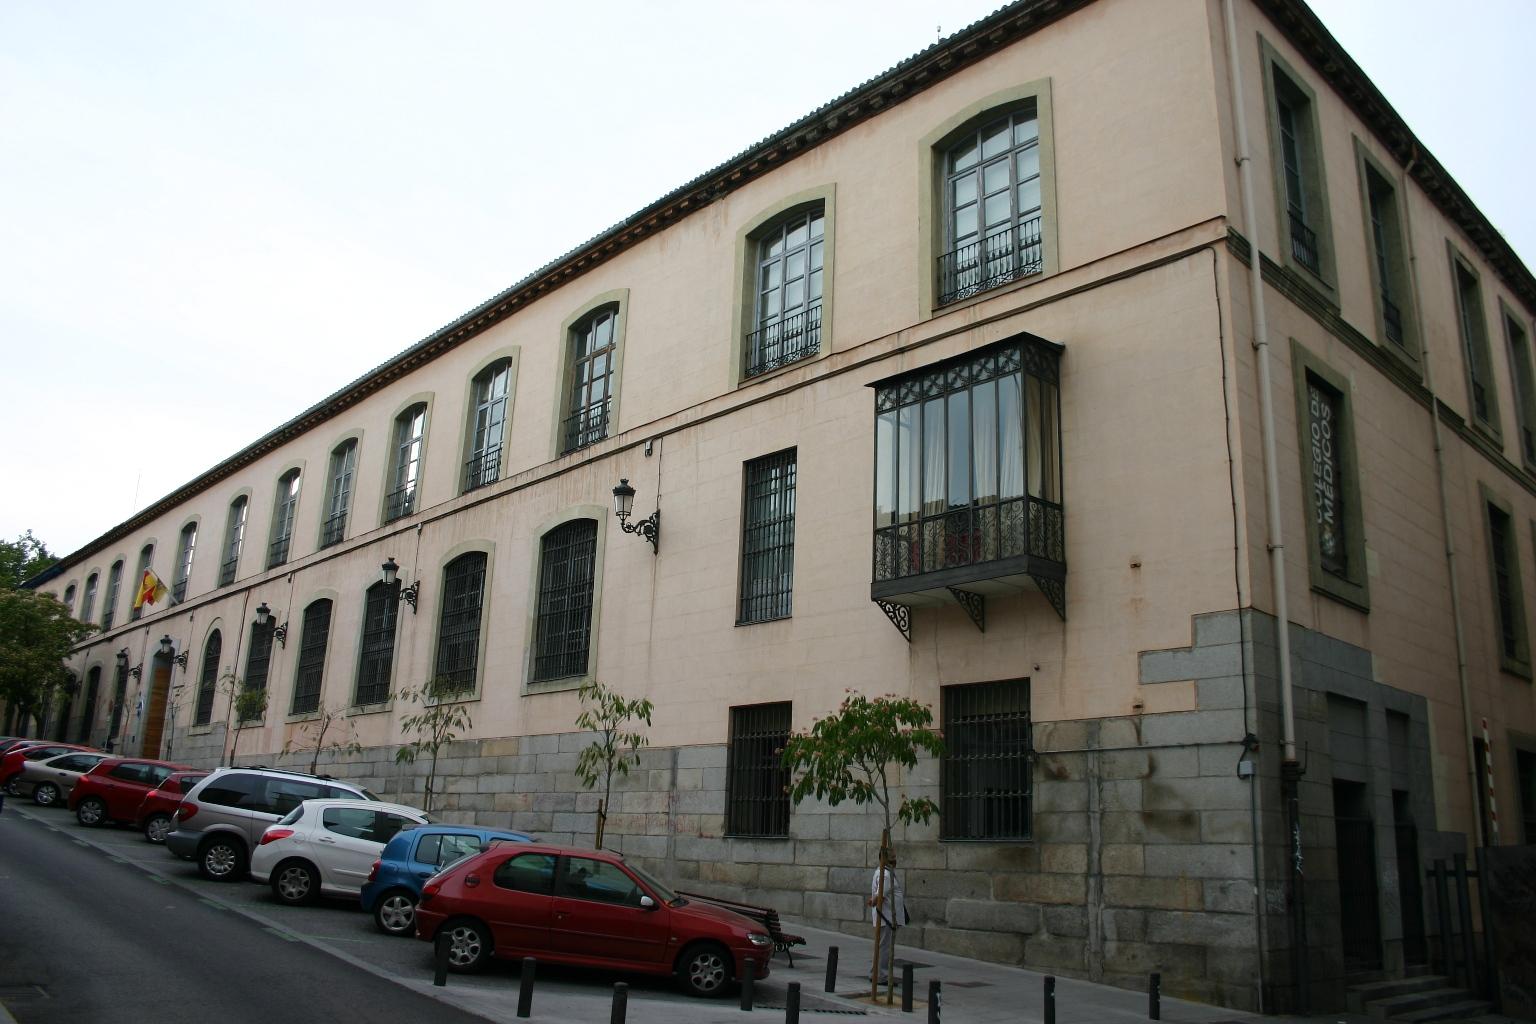 Ilustre colegio oficial de m dicos de madrid himetop - Colegio oficial arquitectos madrid ...